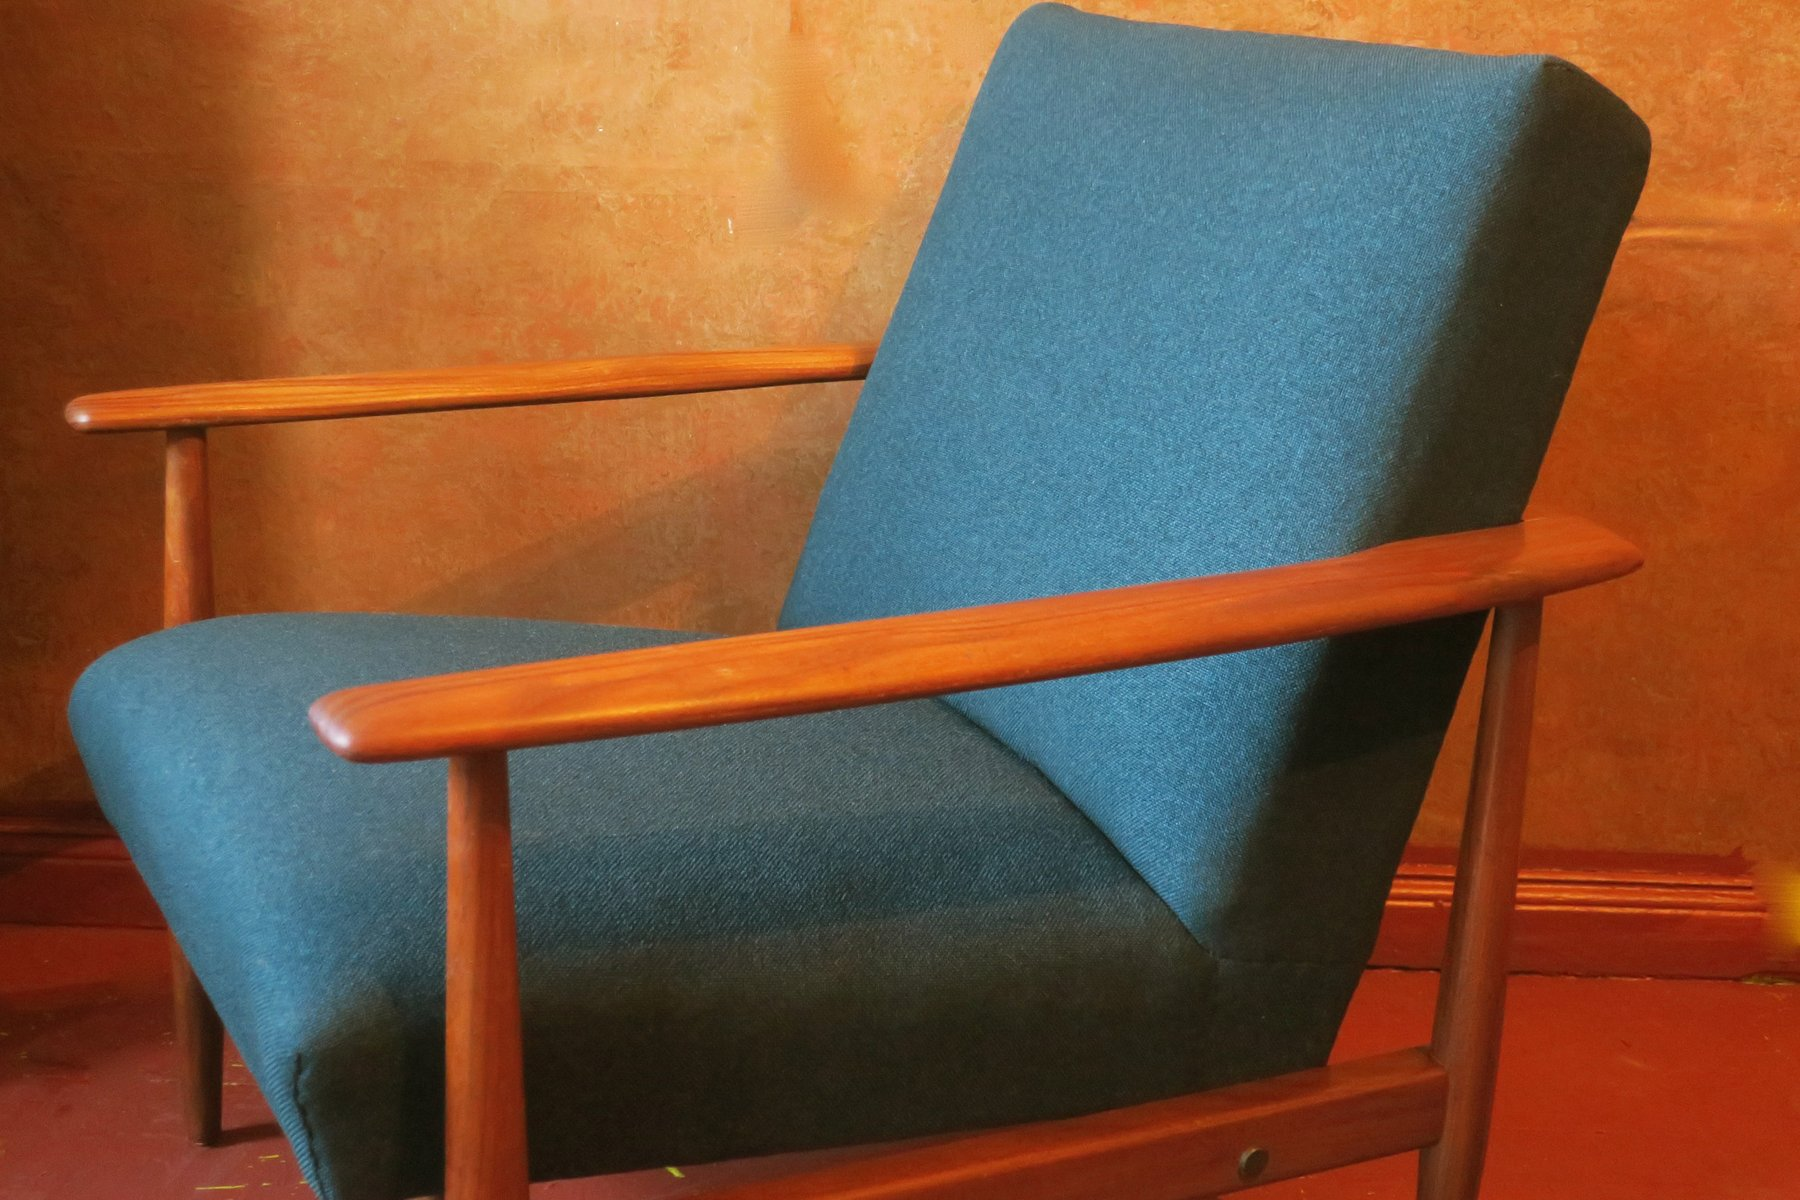 skandinavischer mid century sessel 1960er bei pamono kaufen. Black Bedroom Furniture Sets. Home Design Ideas